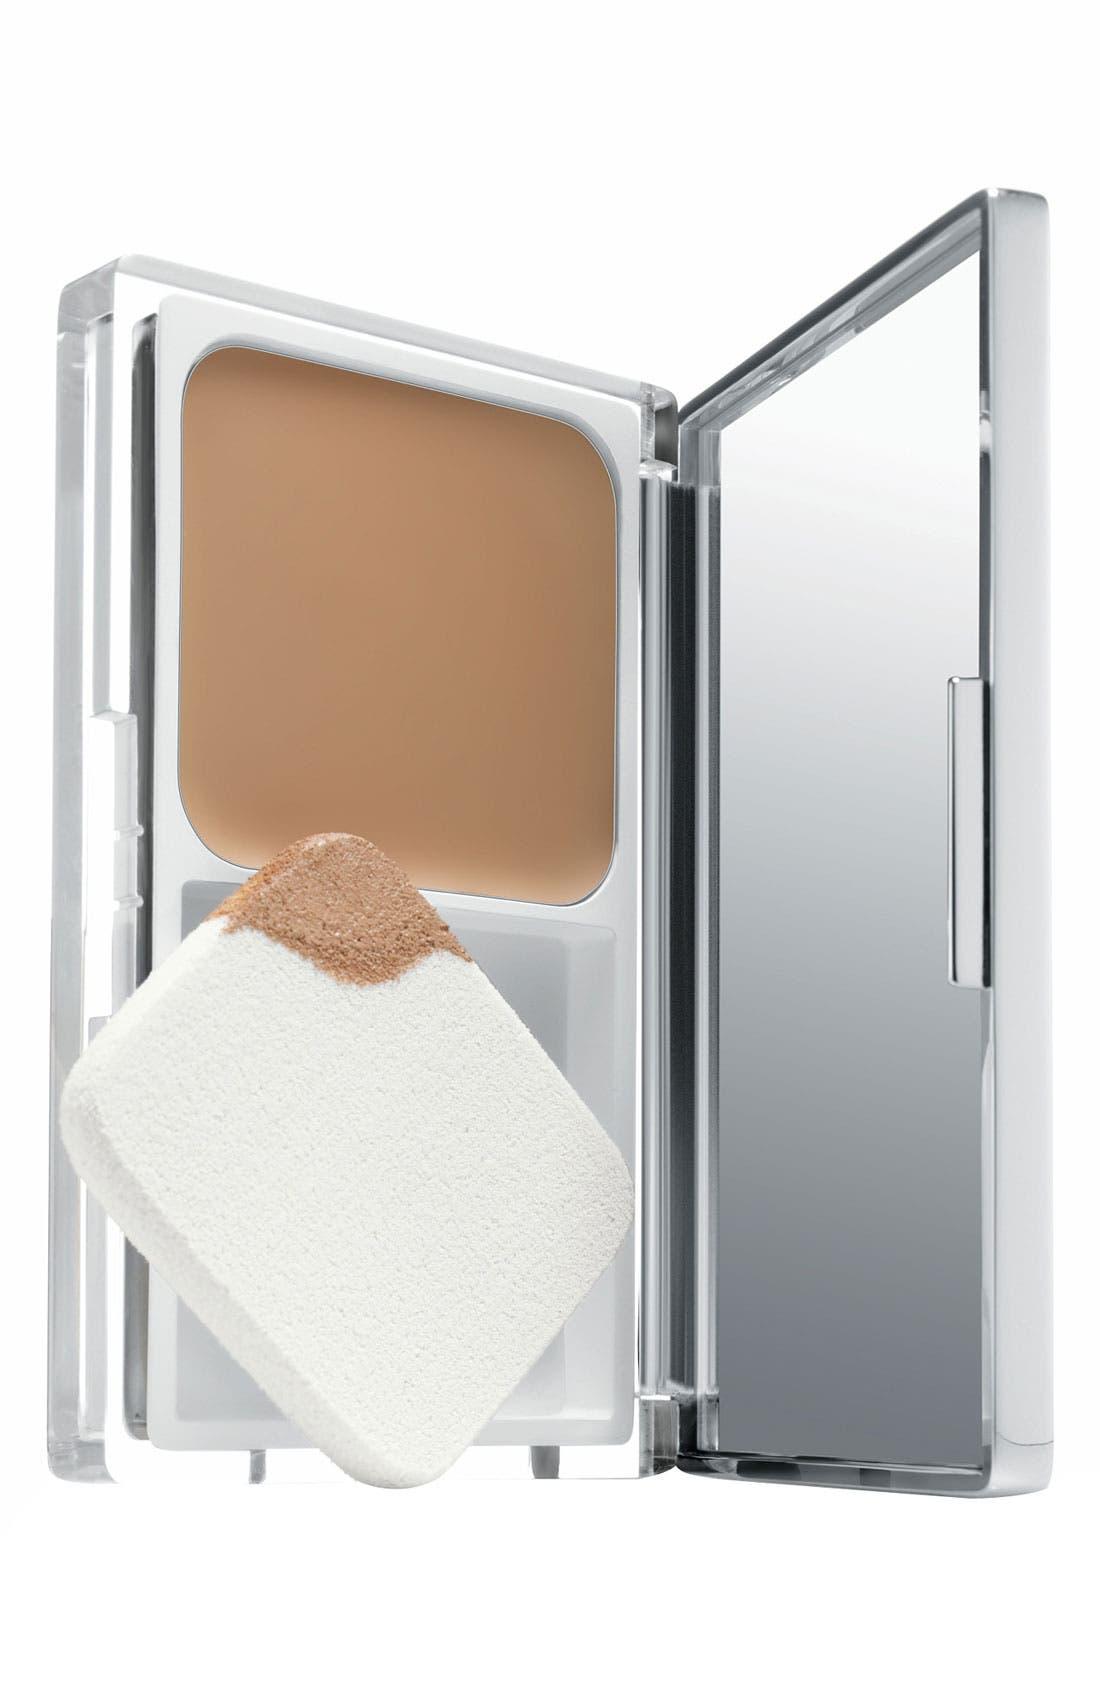 Even Better Compact Makeup Broad Spectrum SPF 15,                             Main thumbnail 1, color,                             CLOVE